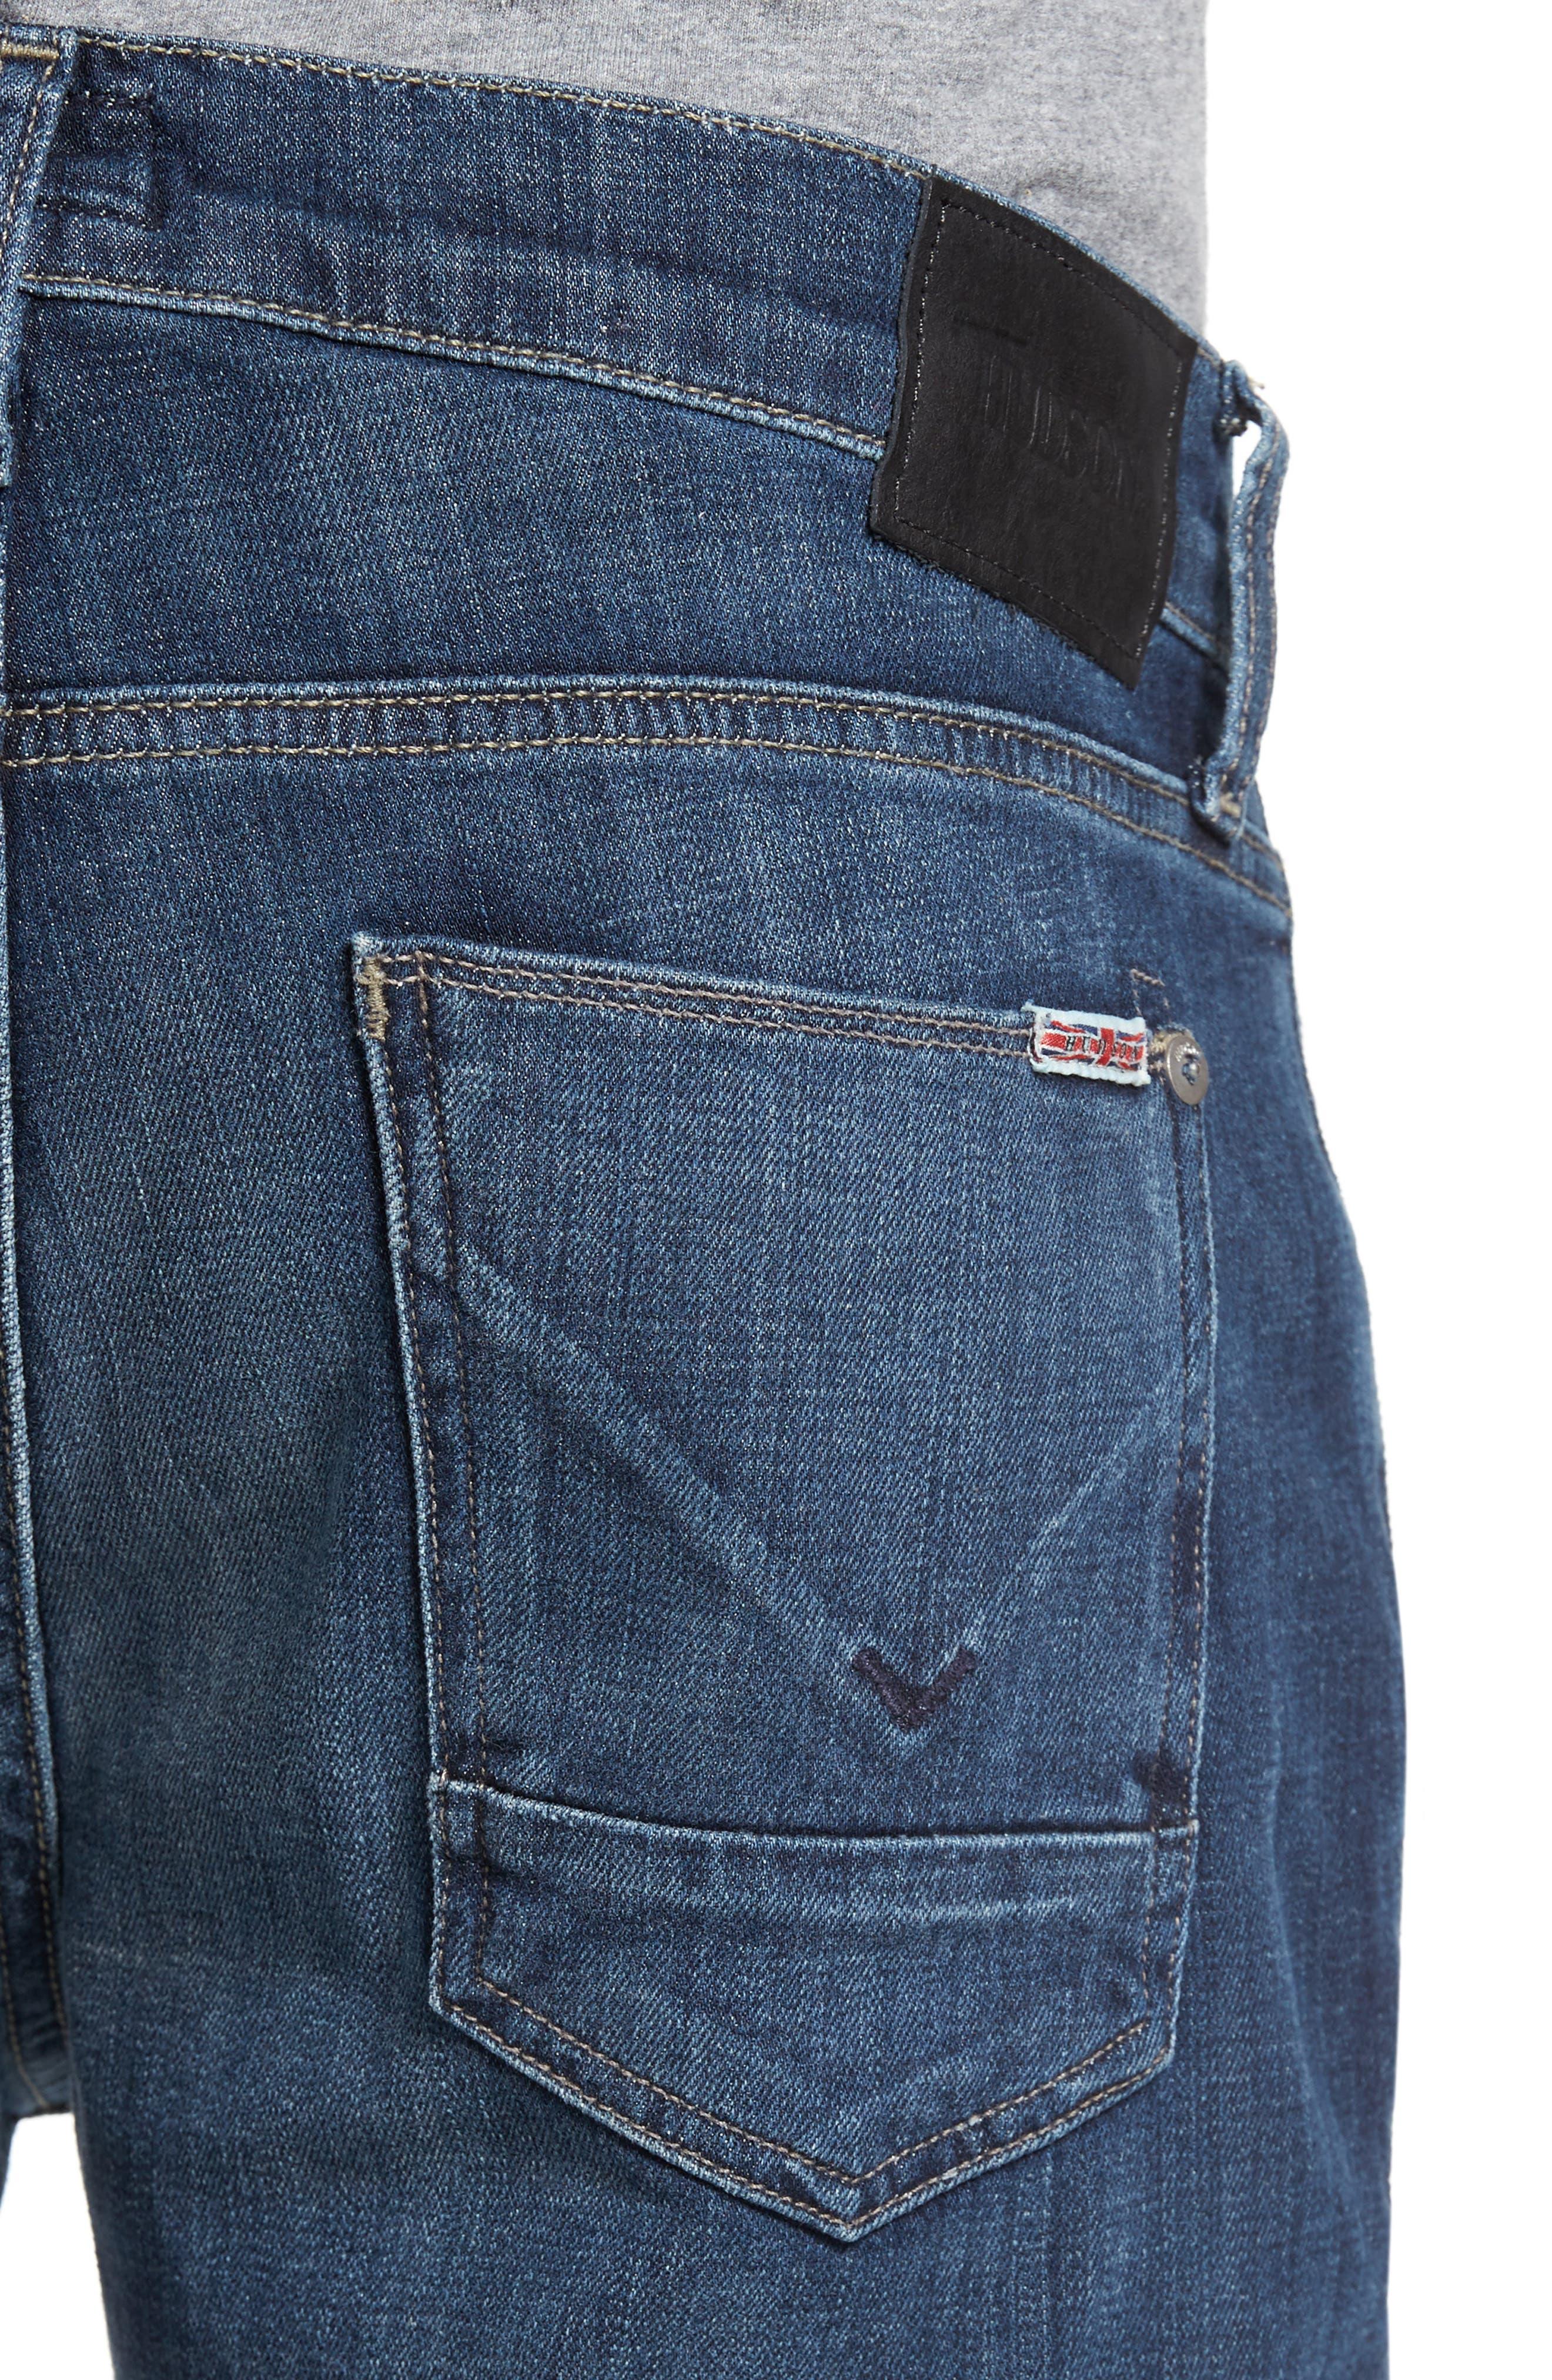 Byron Slim Straight Leg Jean,                             Alternate thumbnail 4, color,                             499